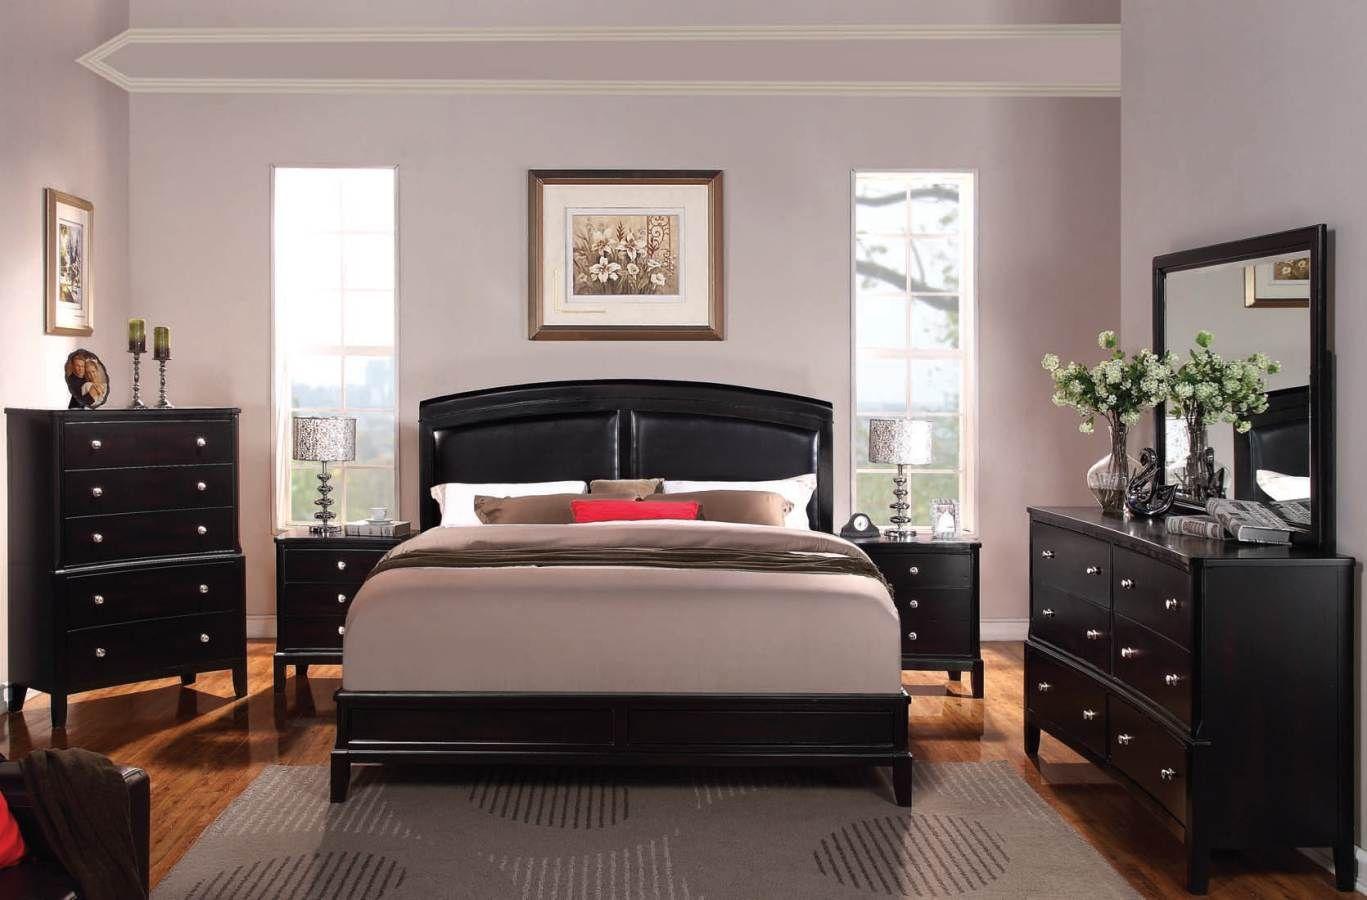 Abram Contemporary Espresso Mirror Dresser 21404 05 Queen Bedroom Furniture Black Bedroom Furniture Wood Bedroom Furniture Sets